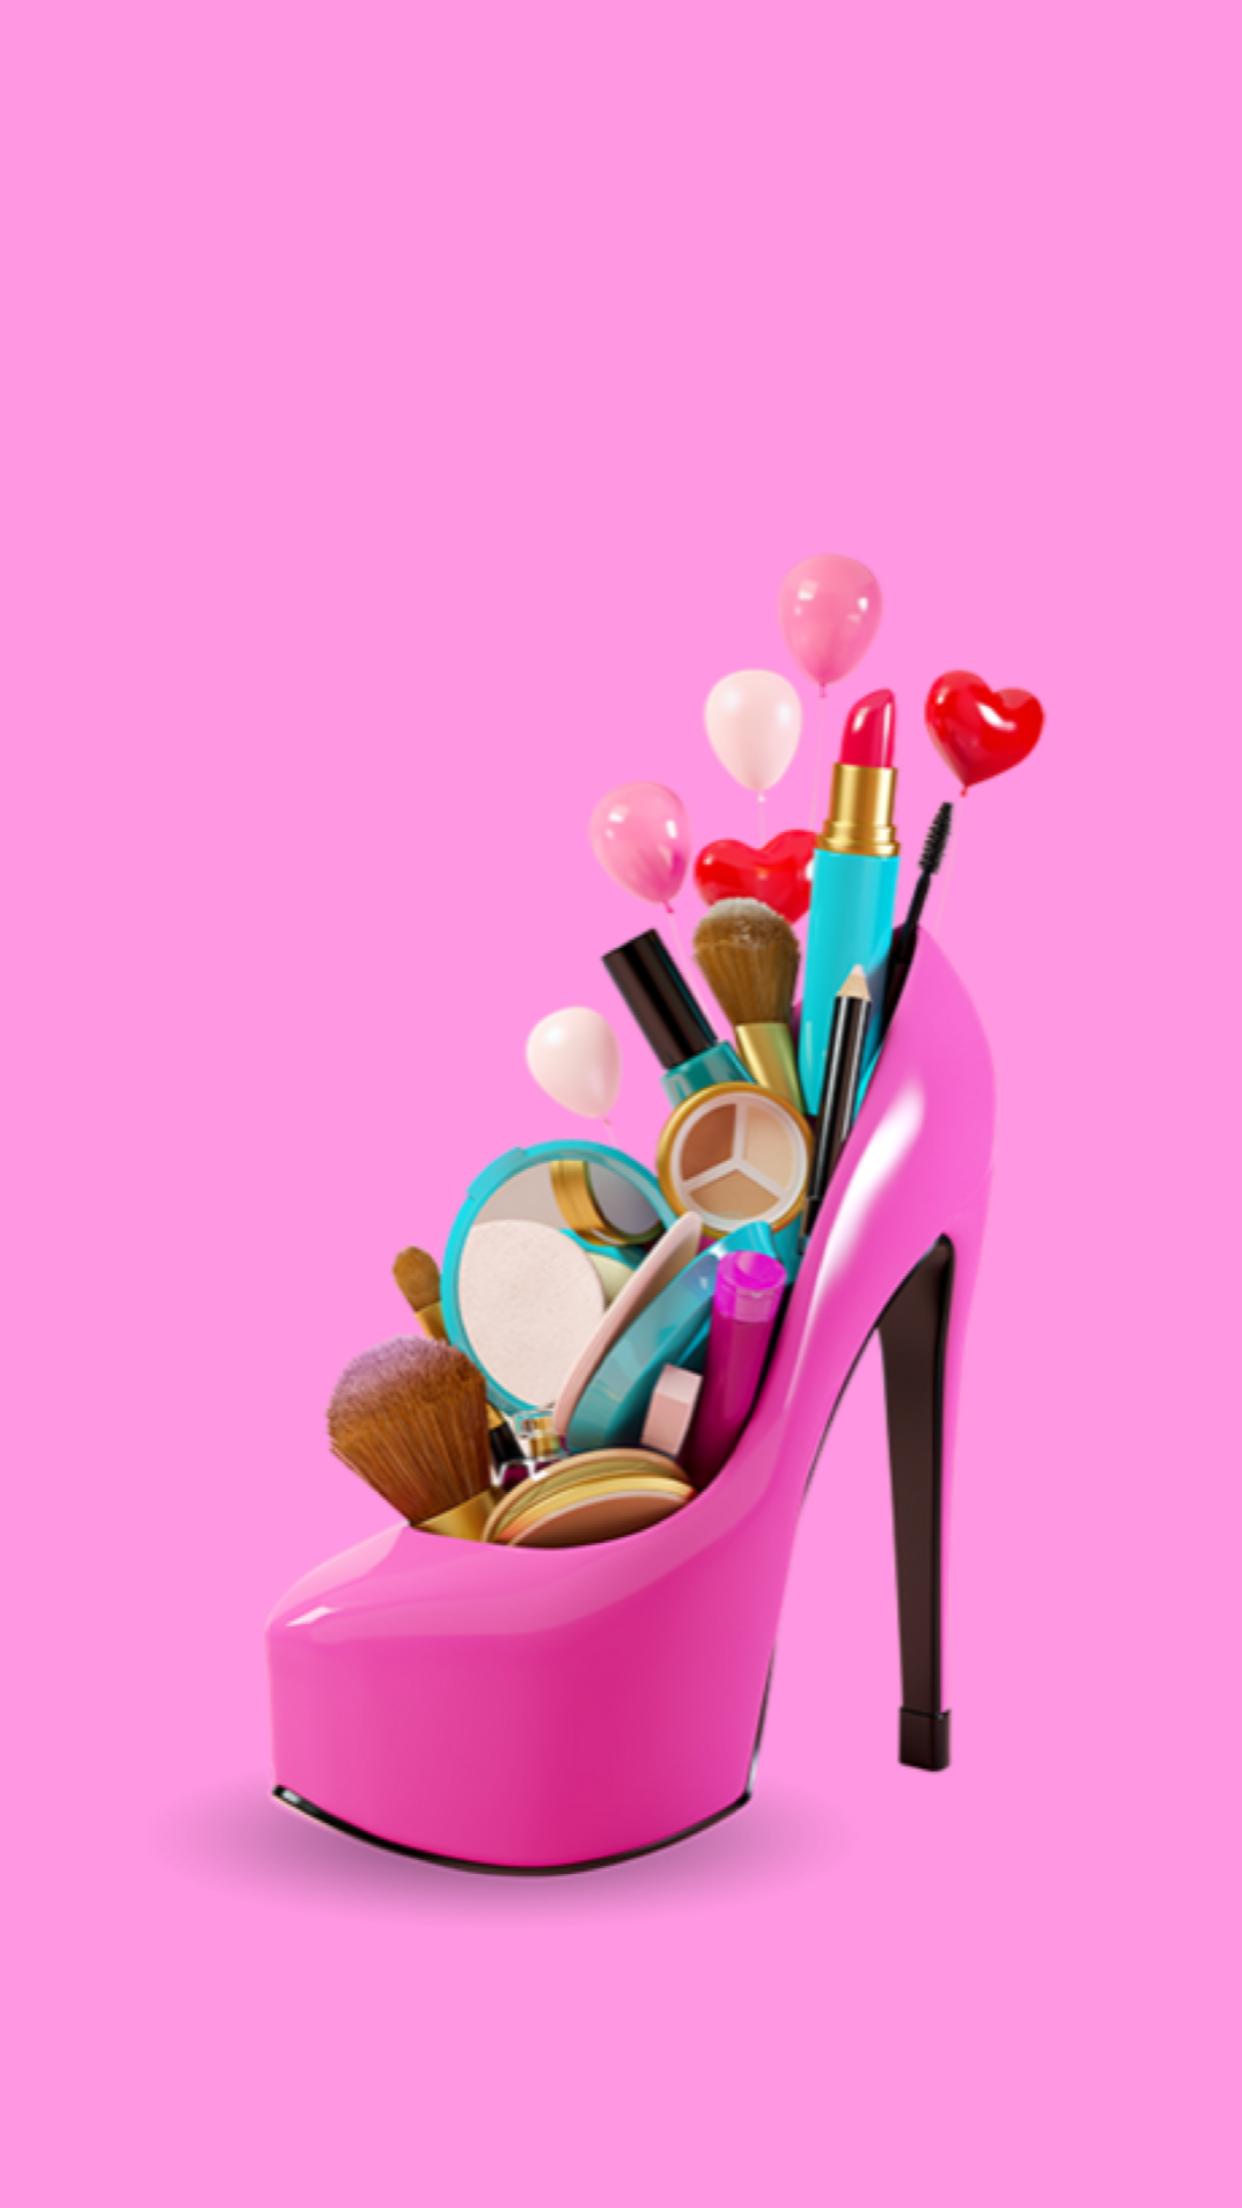 Explore More Wallpapers Anuncios De Maquillaje Fondos Para Anuncios Logos De Maquillaje